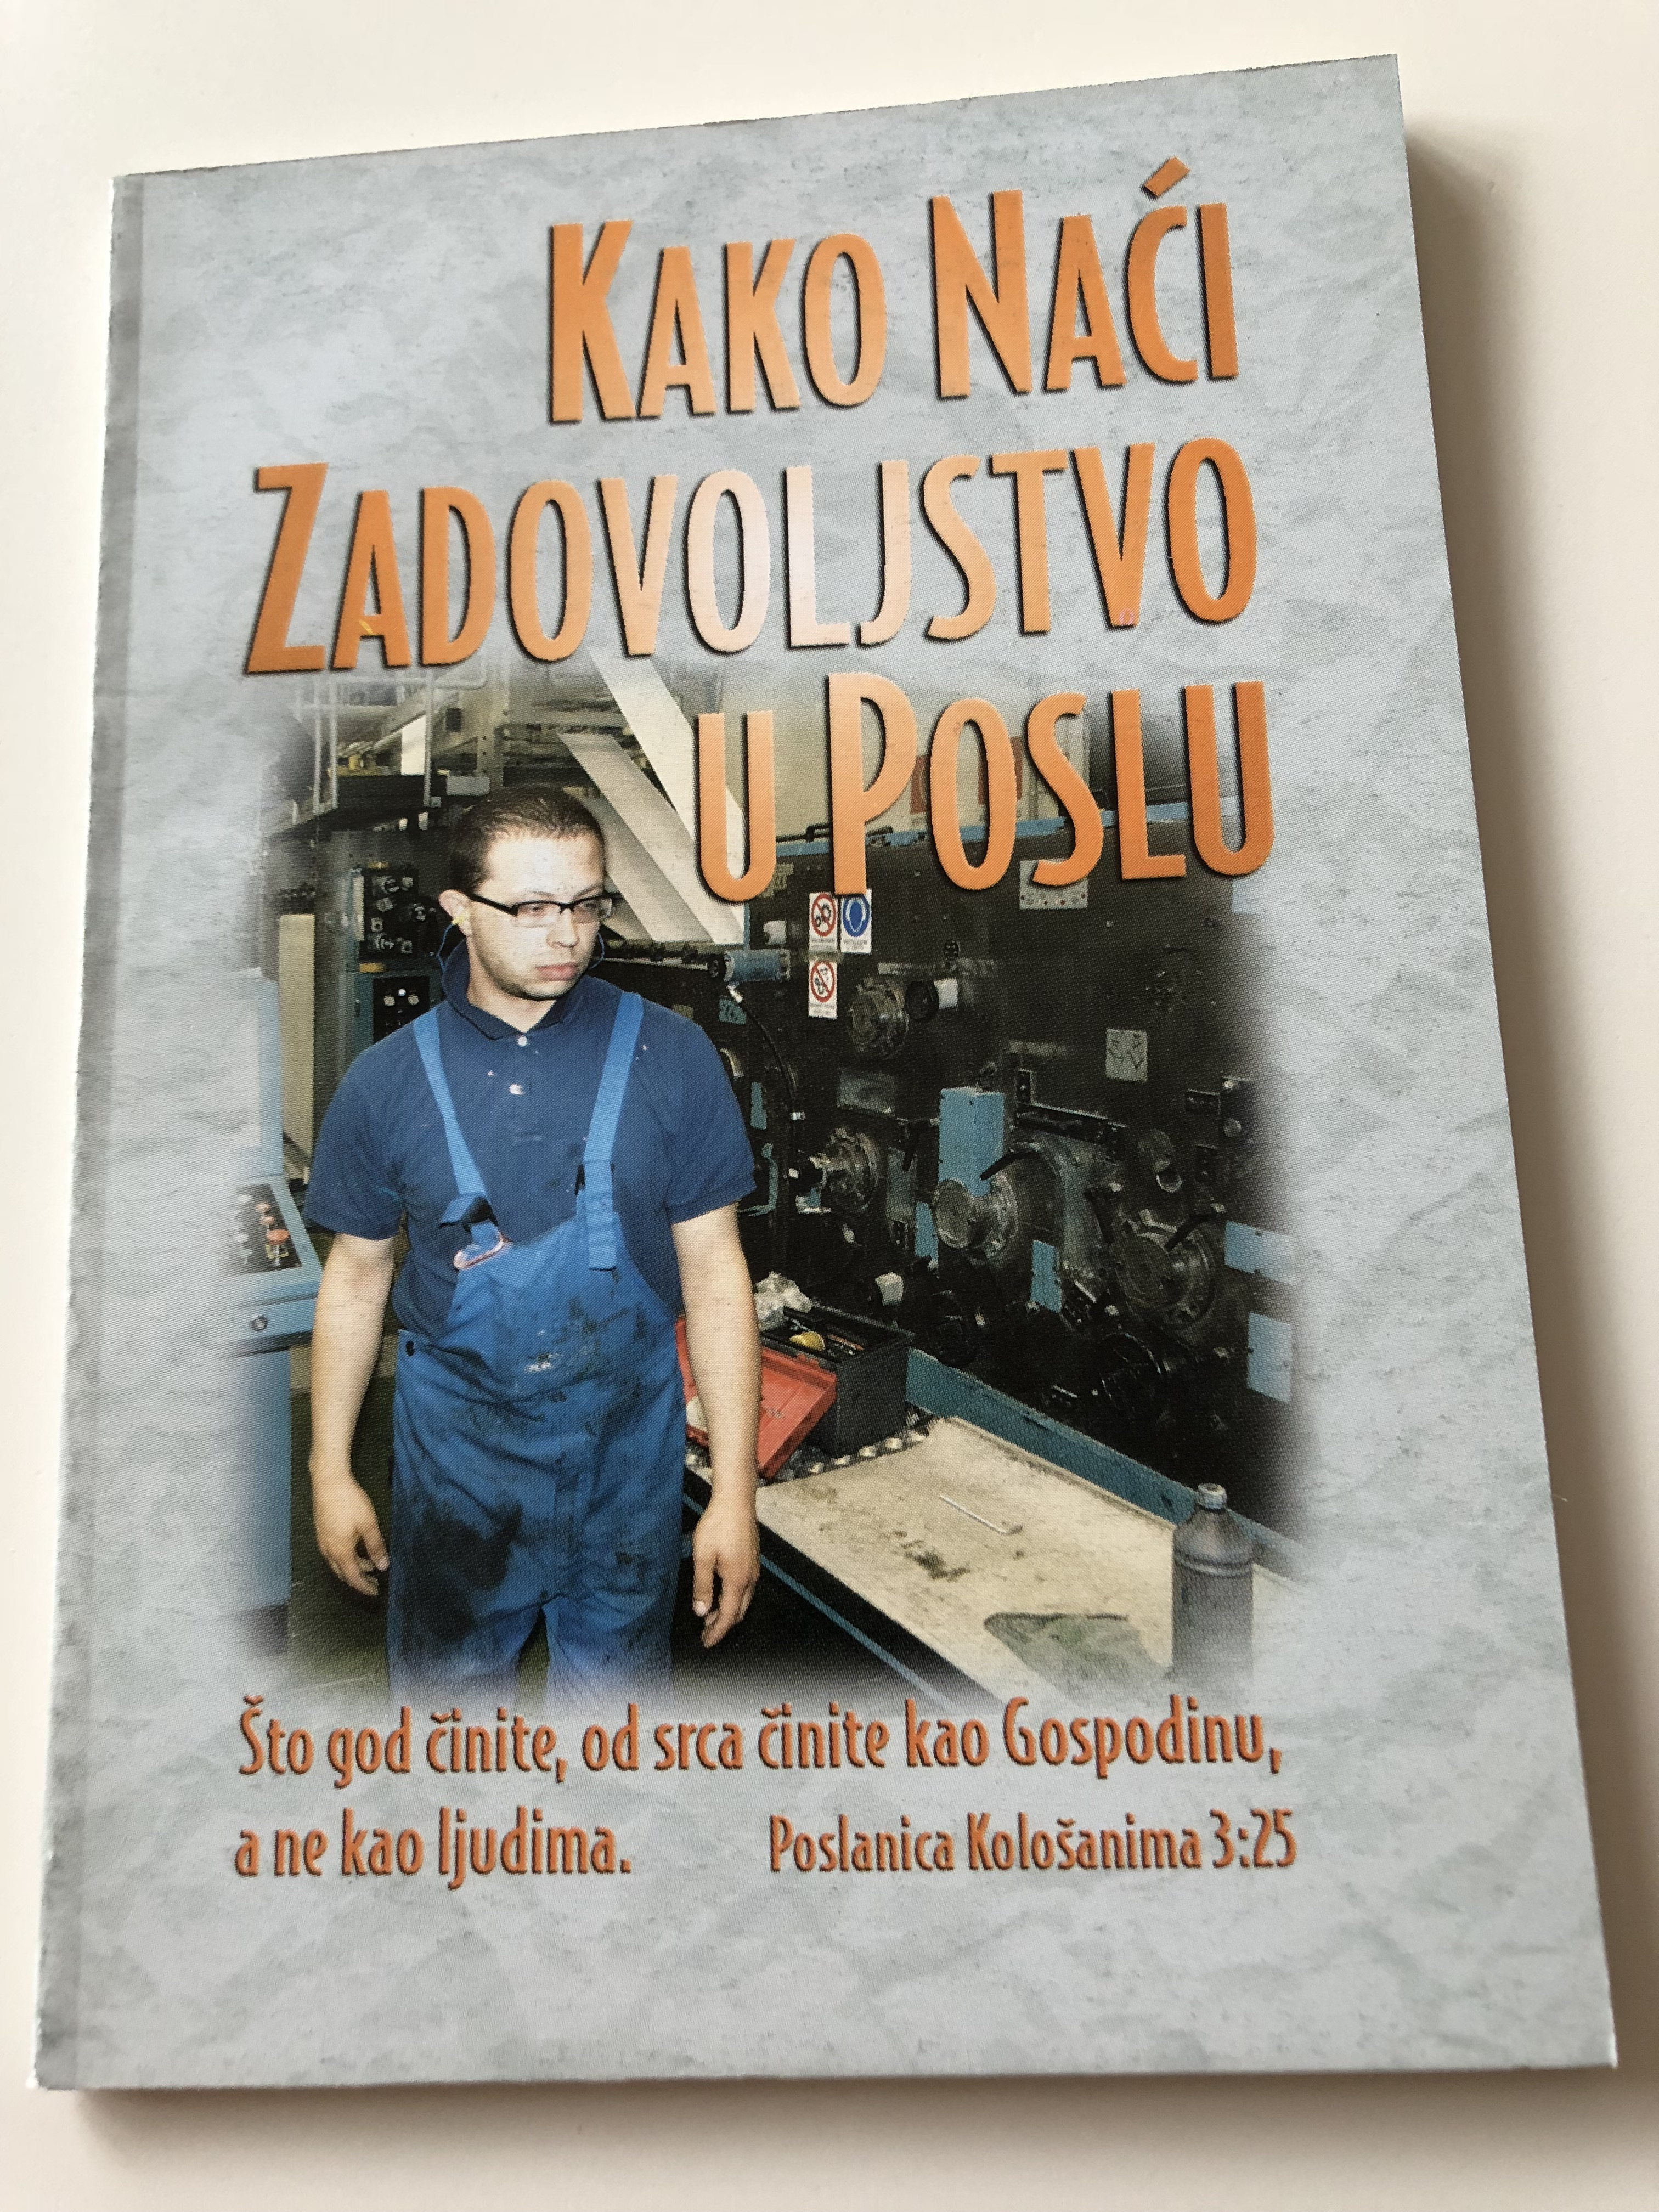 kako-na-i-zadovoljstvo-u-poslu-croatian-language-booklet-how-can-i-findsatisfaction-in-my-work-1-.jpg